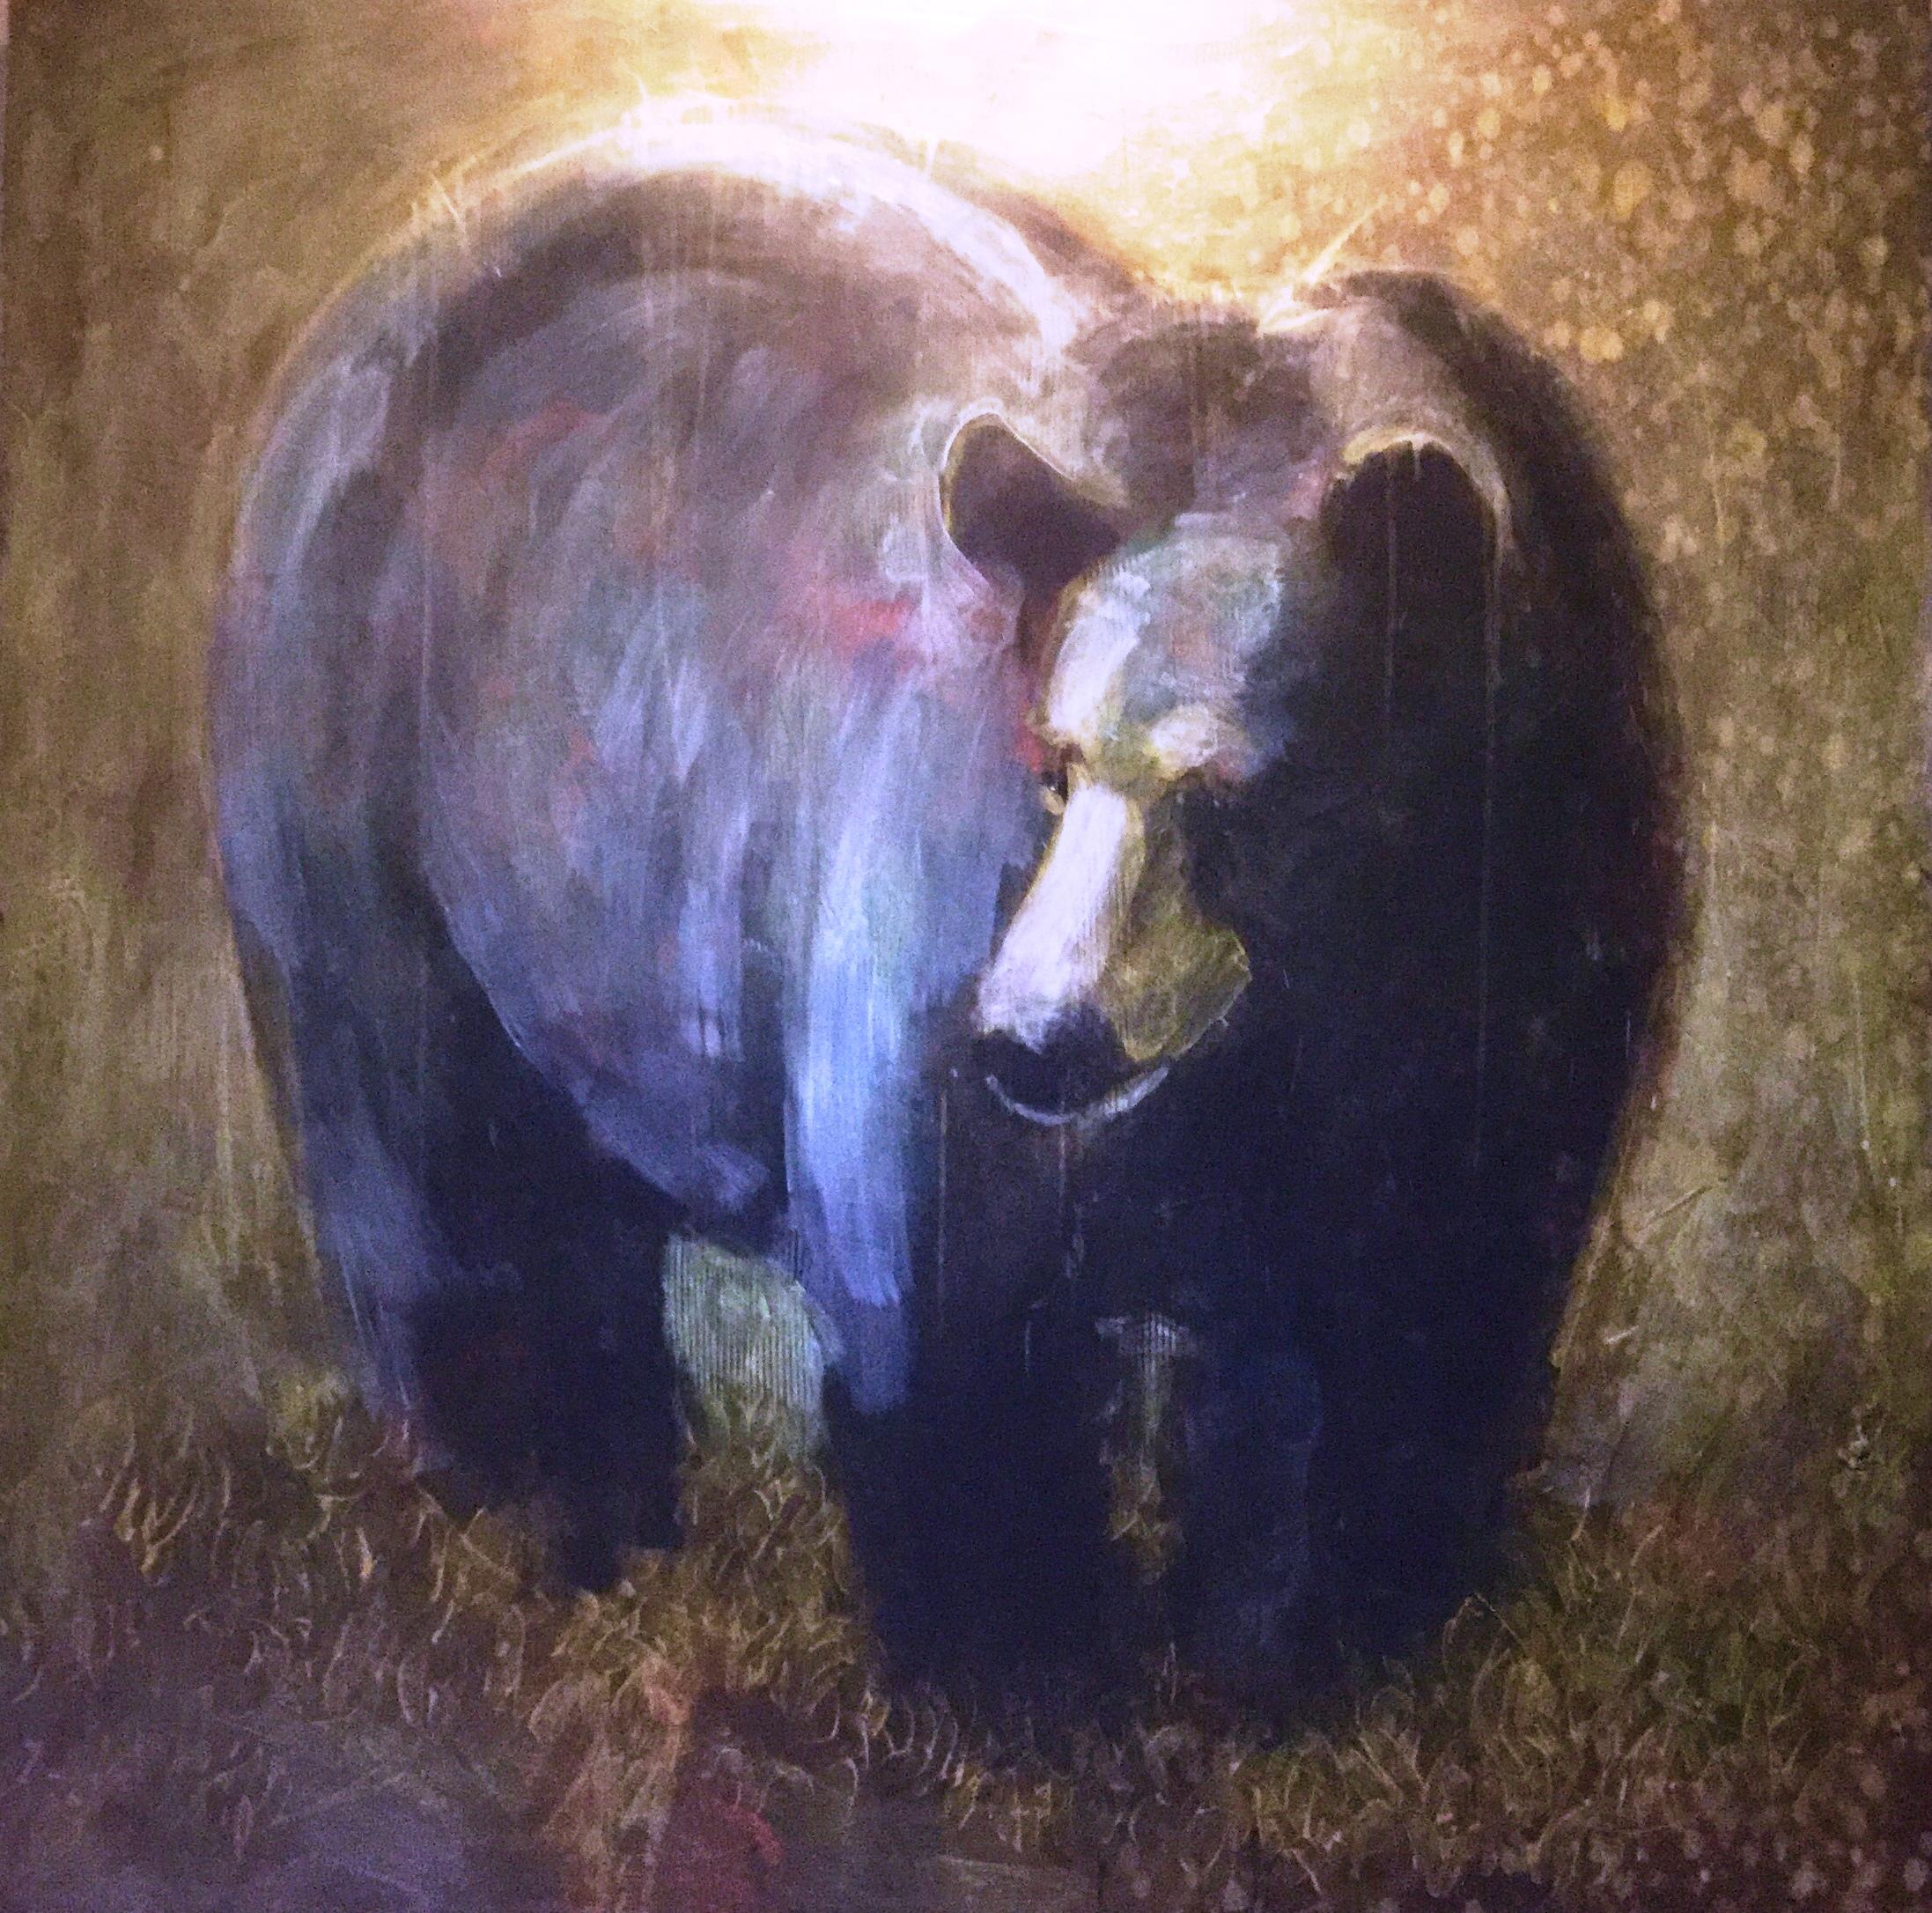 Black Bear artwork by Les Thomas - art listed for sale on Artplode